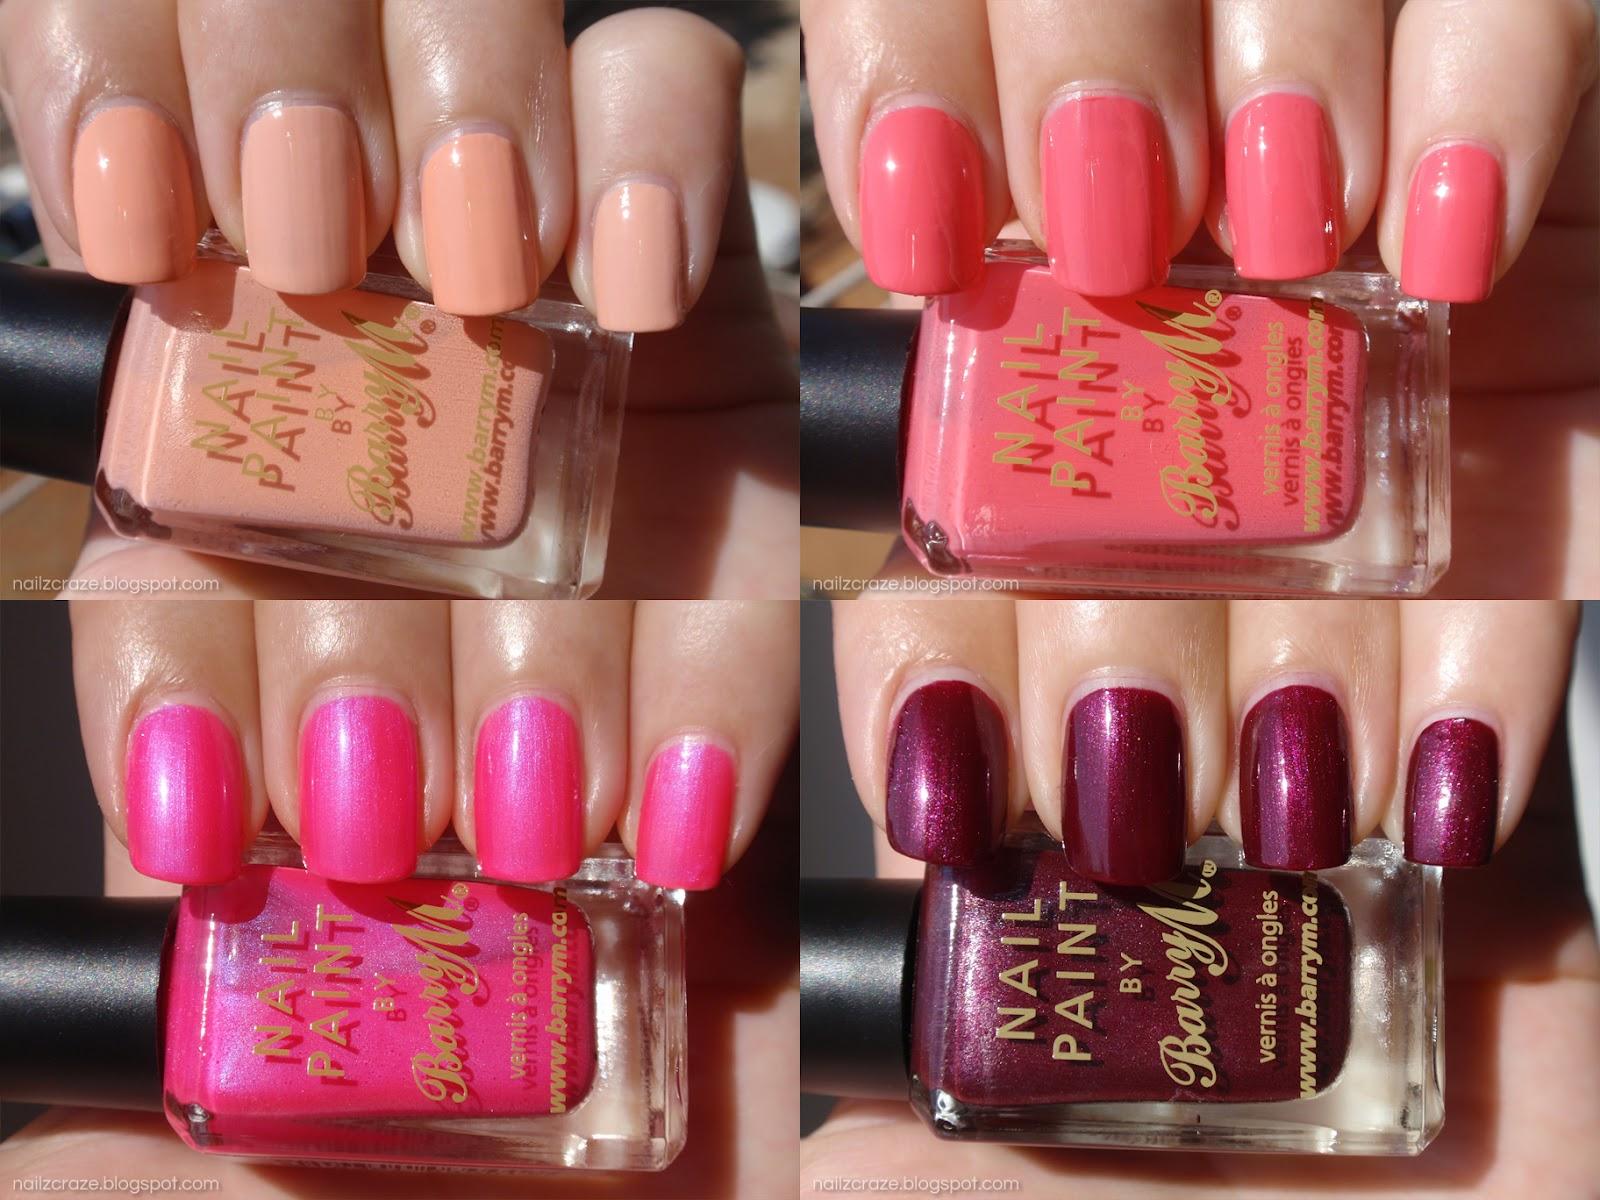 Oppza Glamorous World Nail Polish Brands